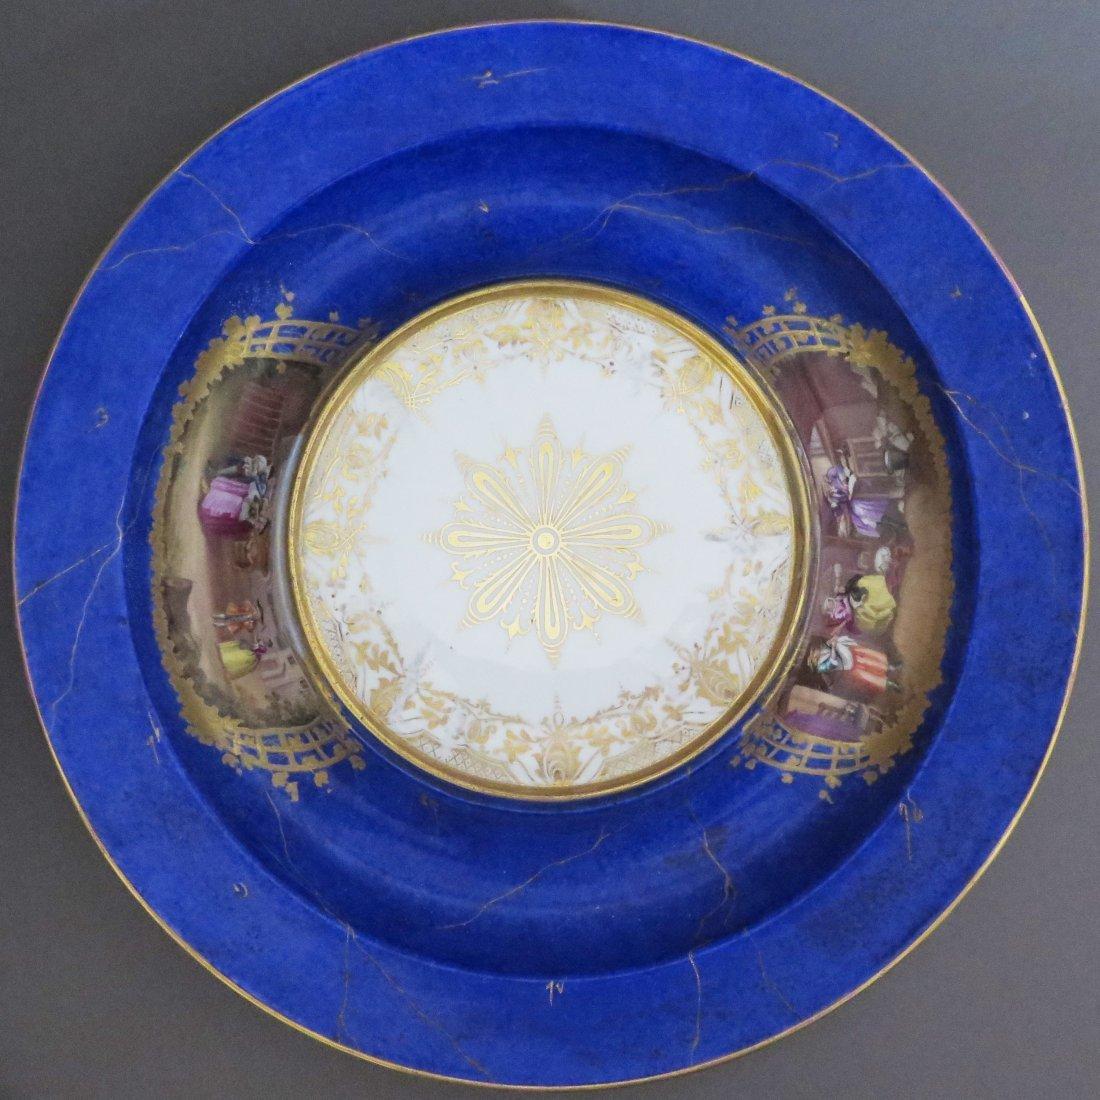 Meissen Porcelain Lidded Punch Bowl and Underplat - 6